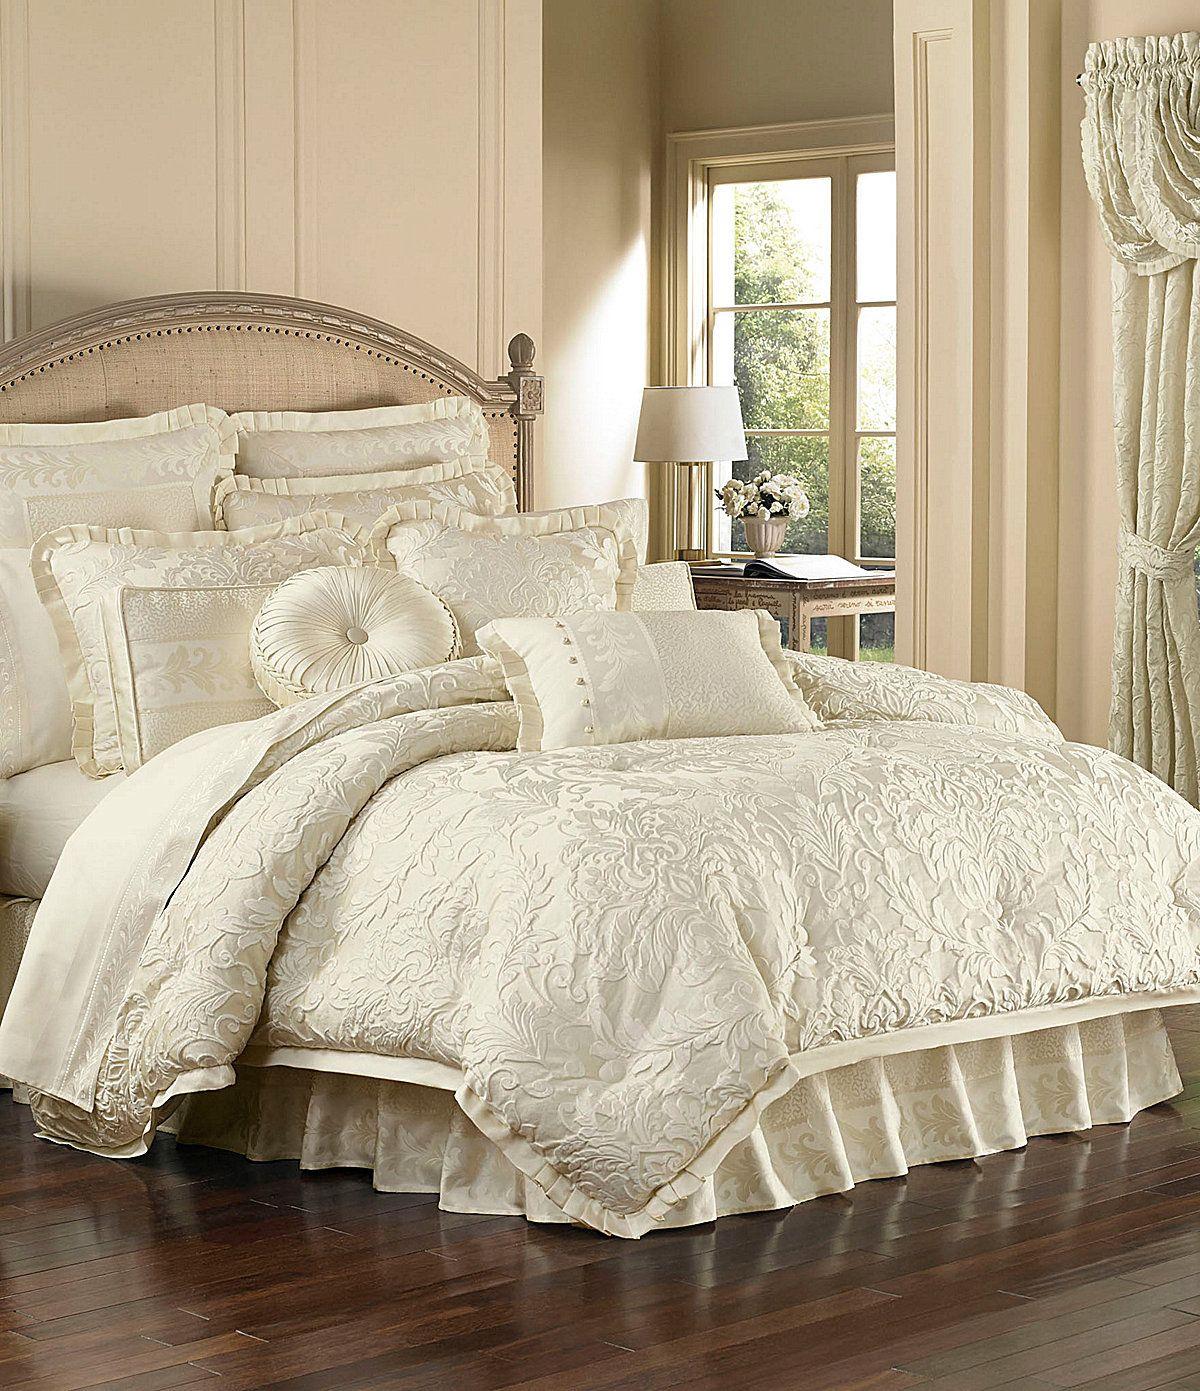 Master Bedroom Bedding Collections J Queen New York Olympia Bedding Collection Dillardscom